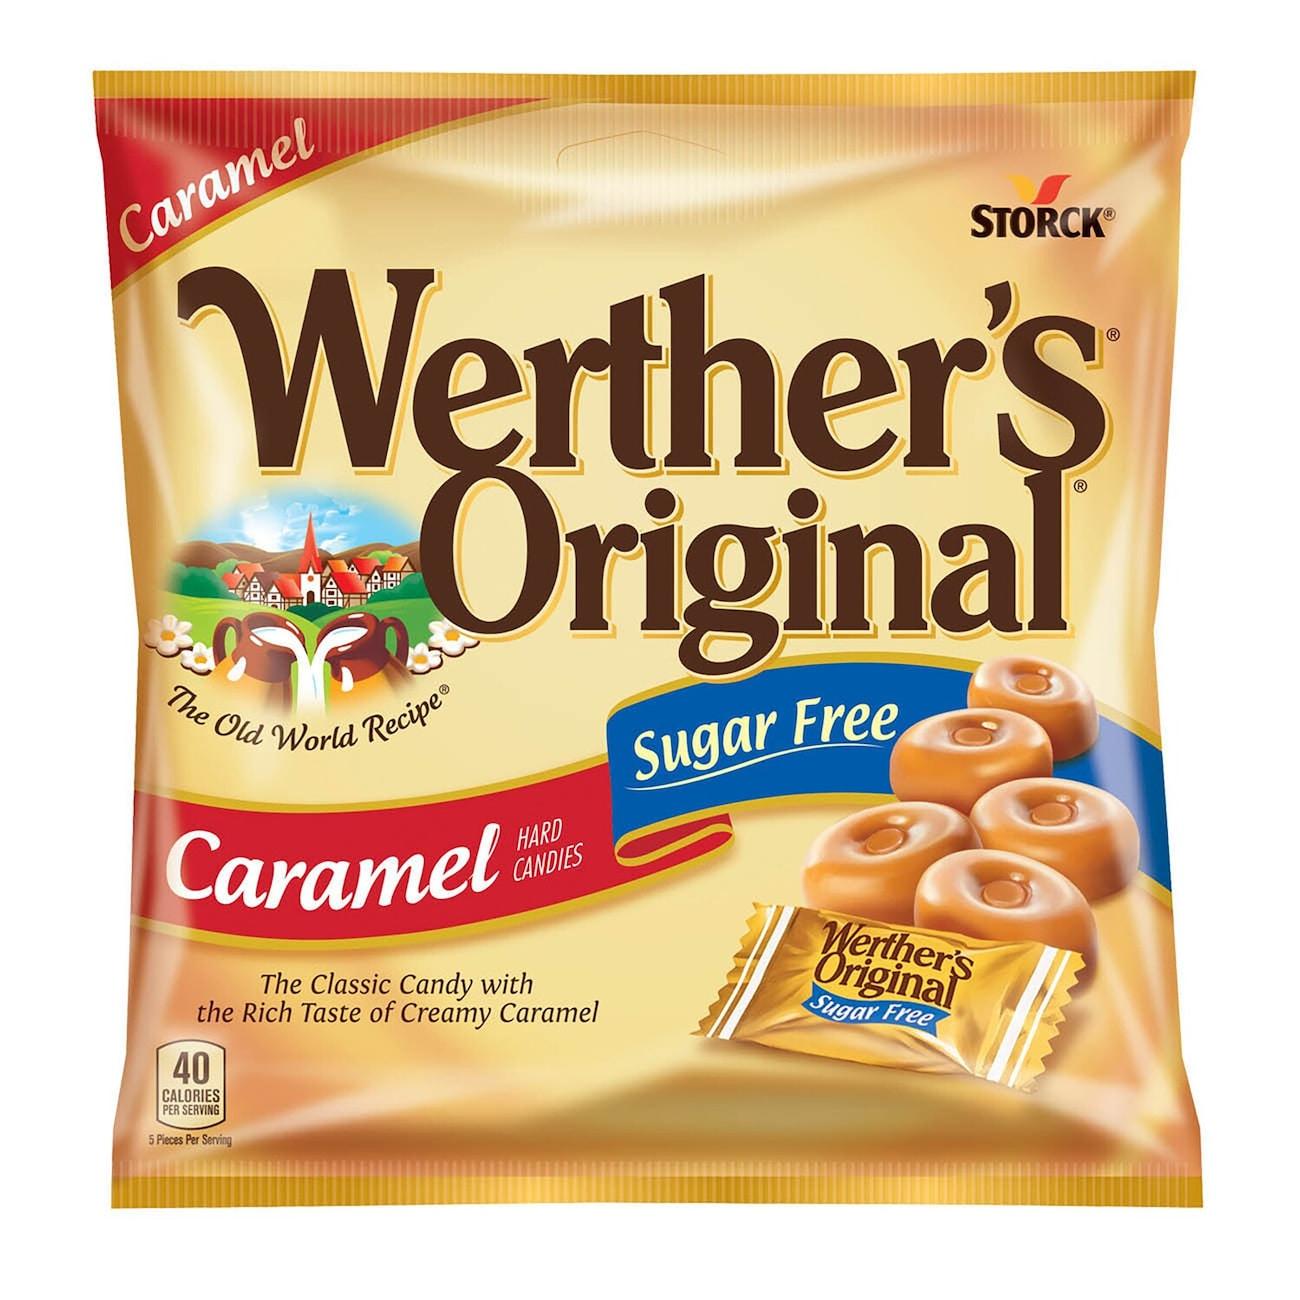 Sugar Free Candy Burnt Cinnamon Lemonhead Lip Smack Box Display Product Reviews For Werthers Originals Hard Candies 146 Oz